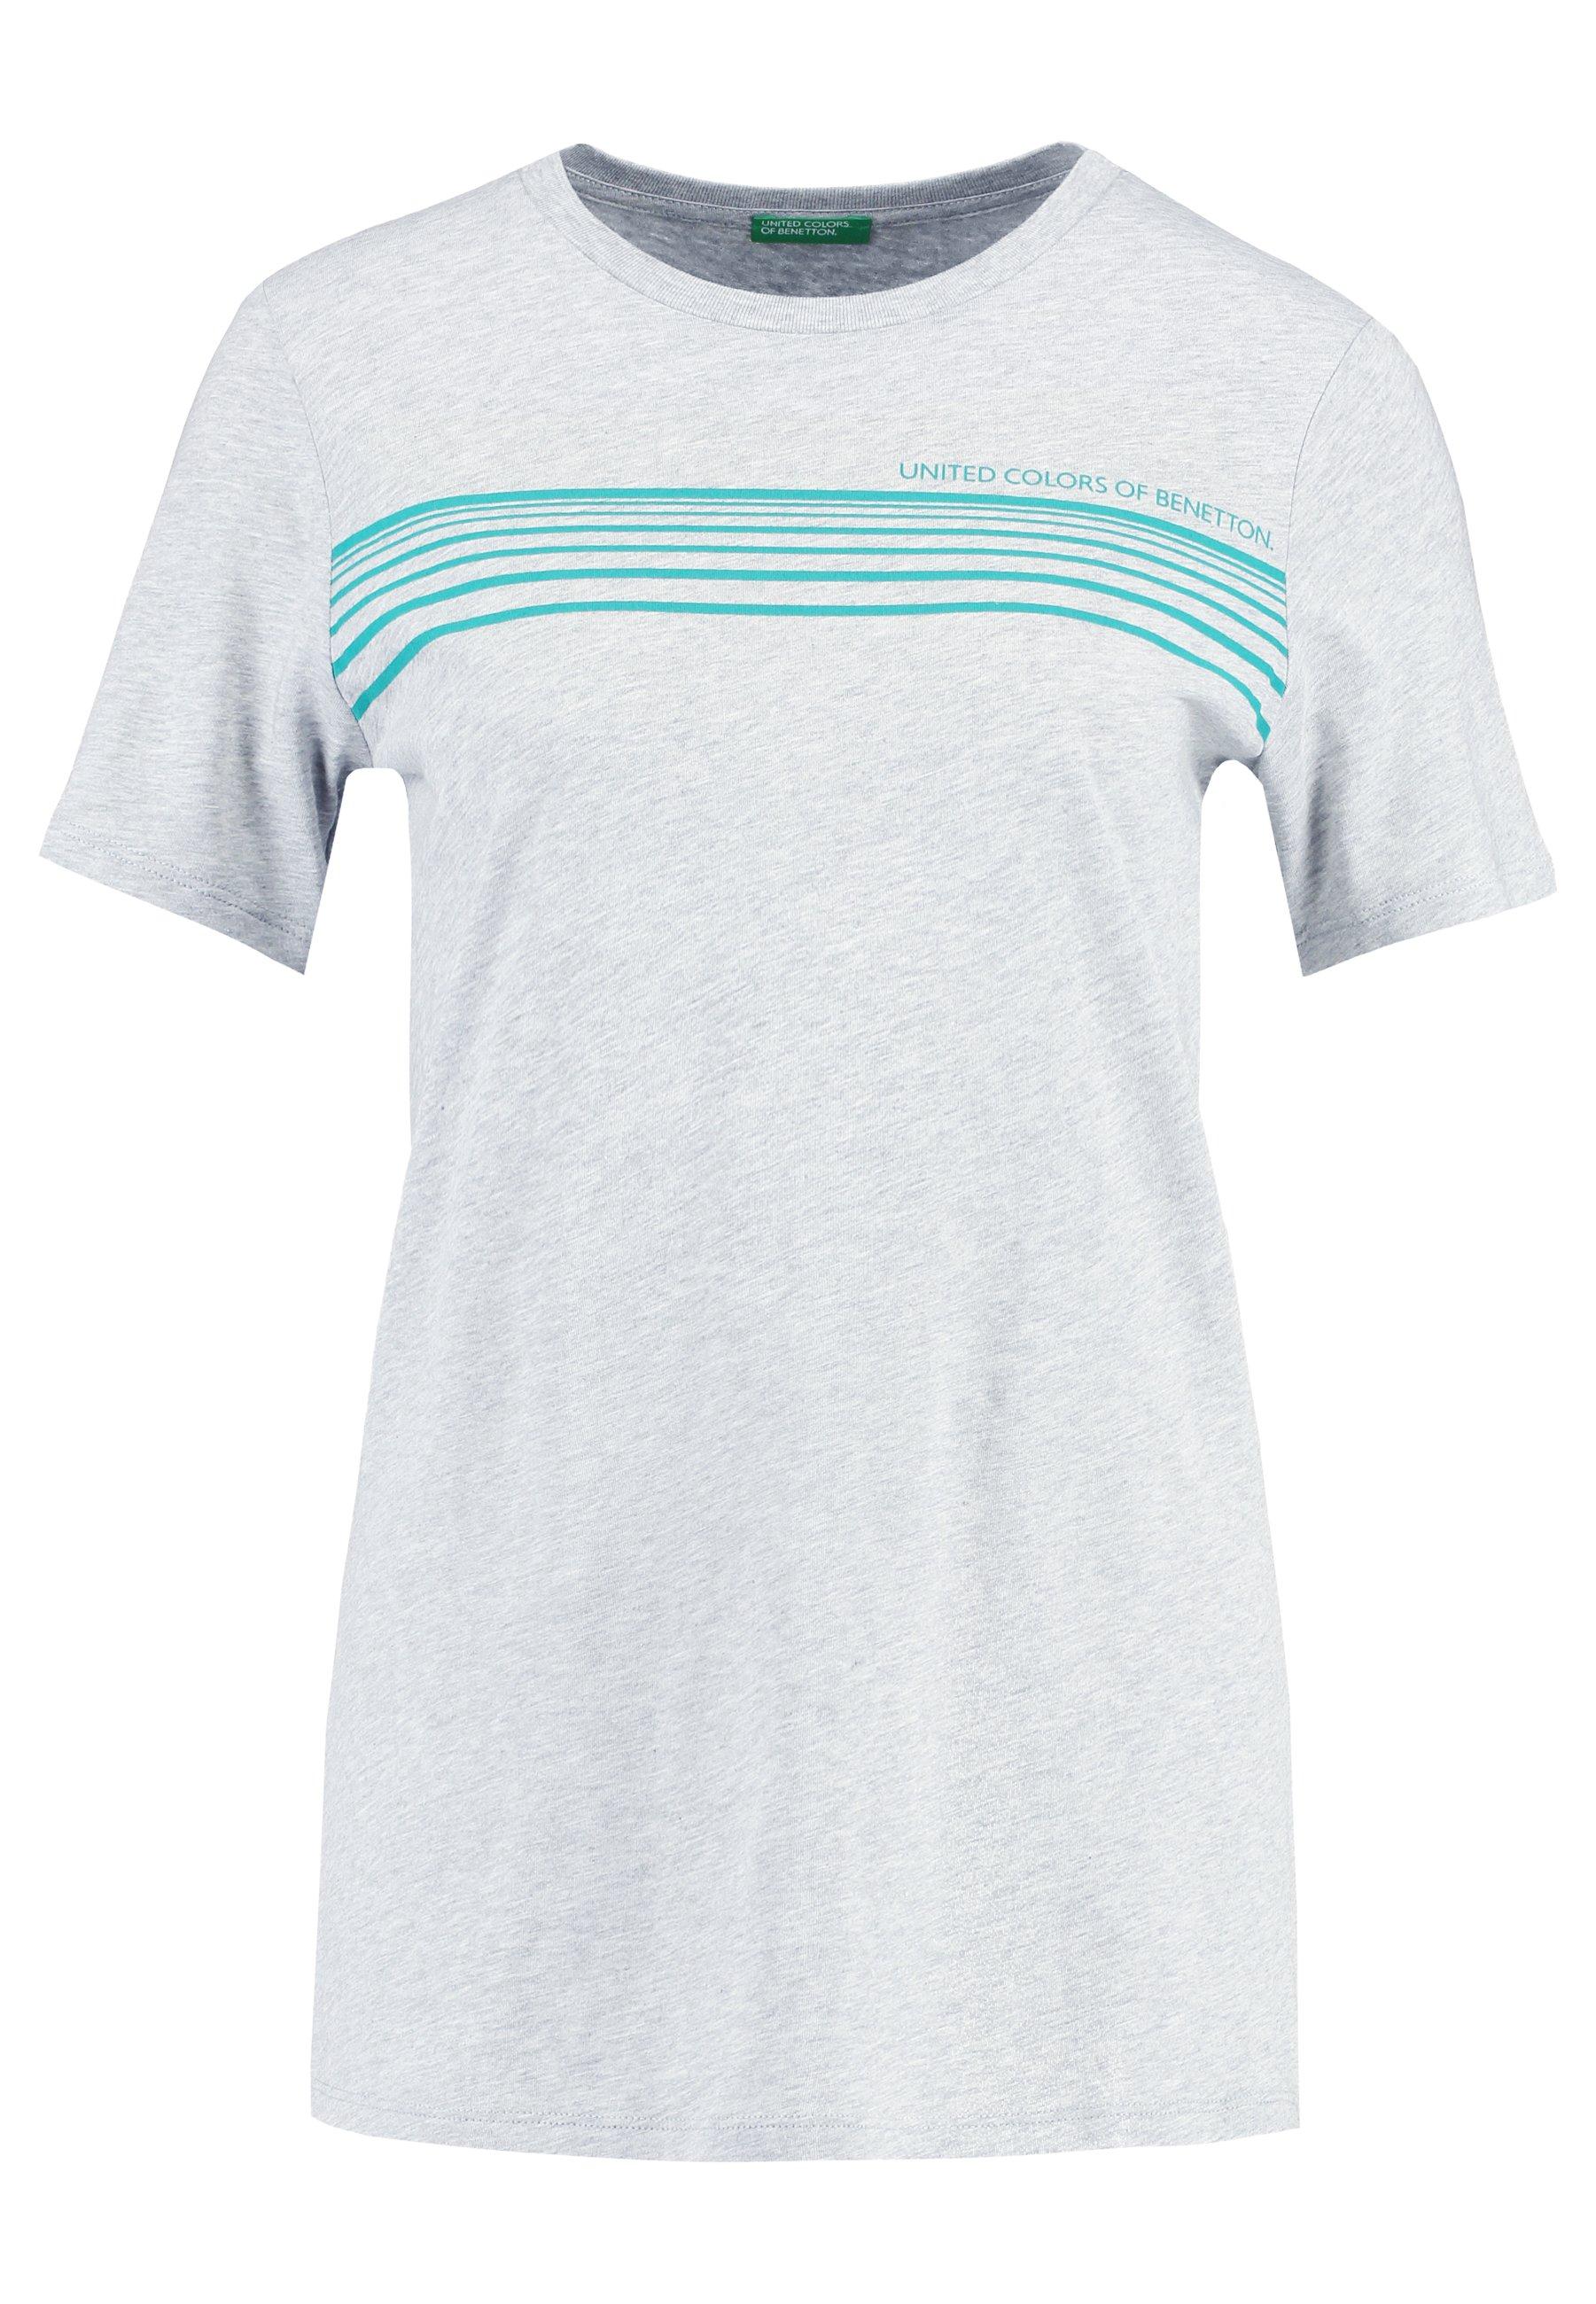 Benetton ROUND NECK TEE LOGO - T-shirt imprimé grey